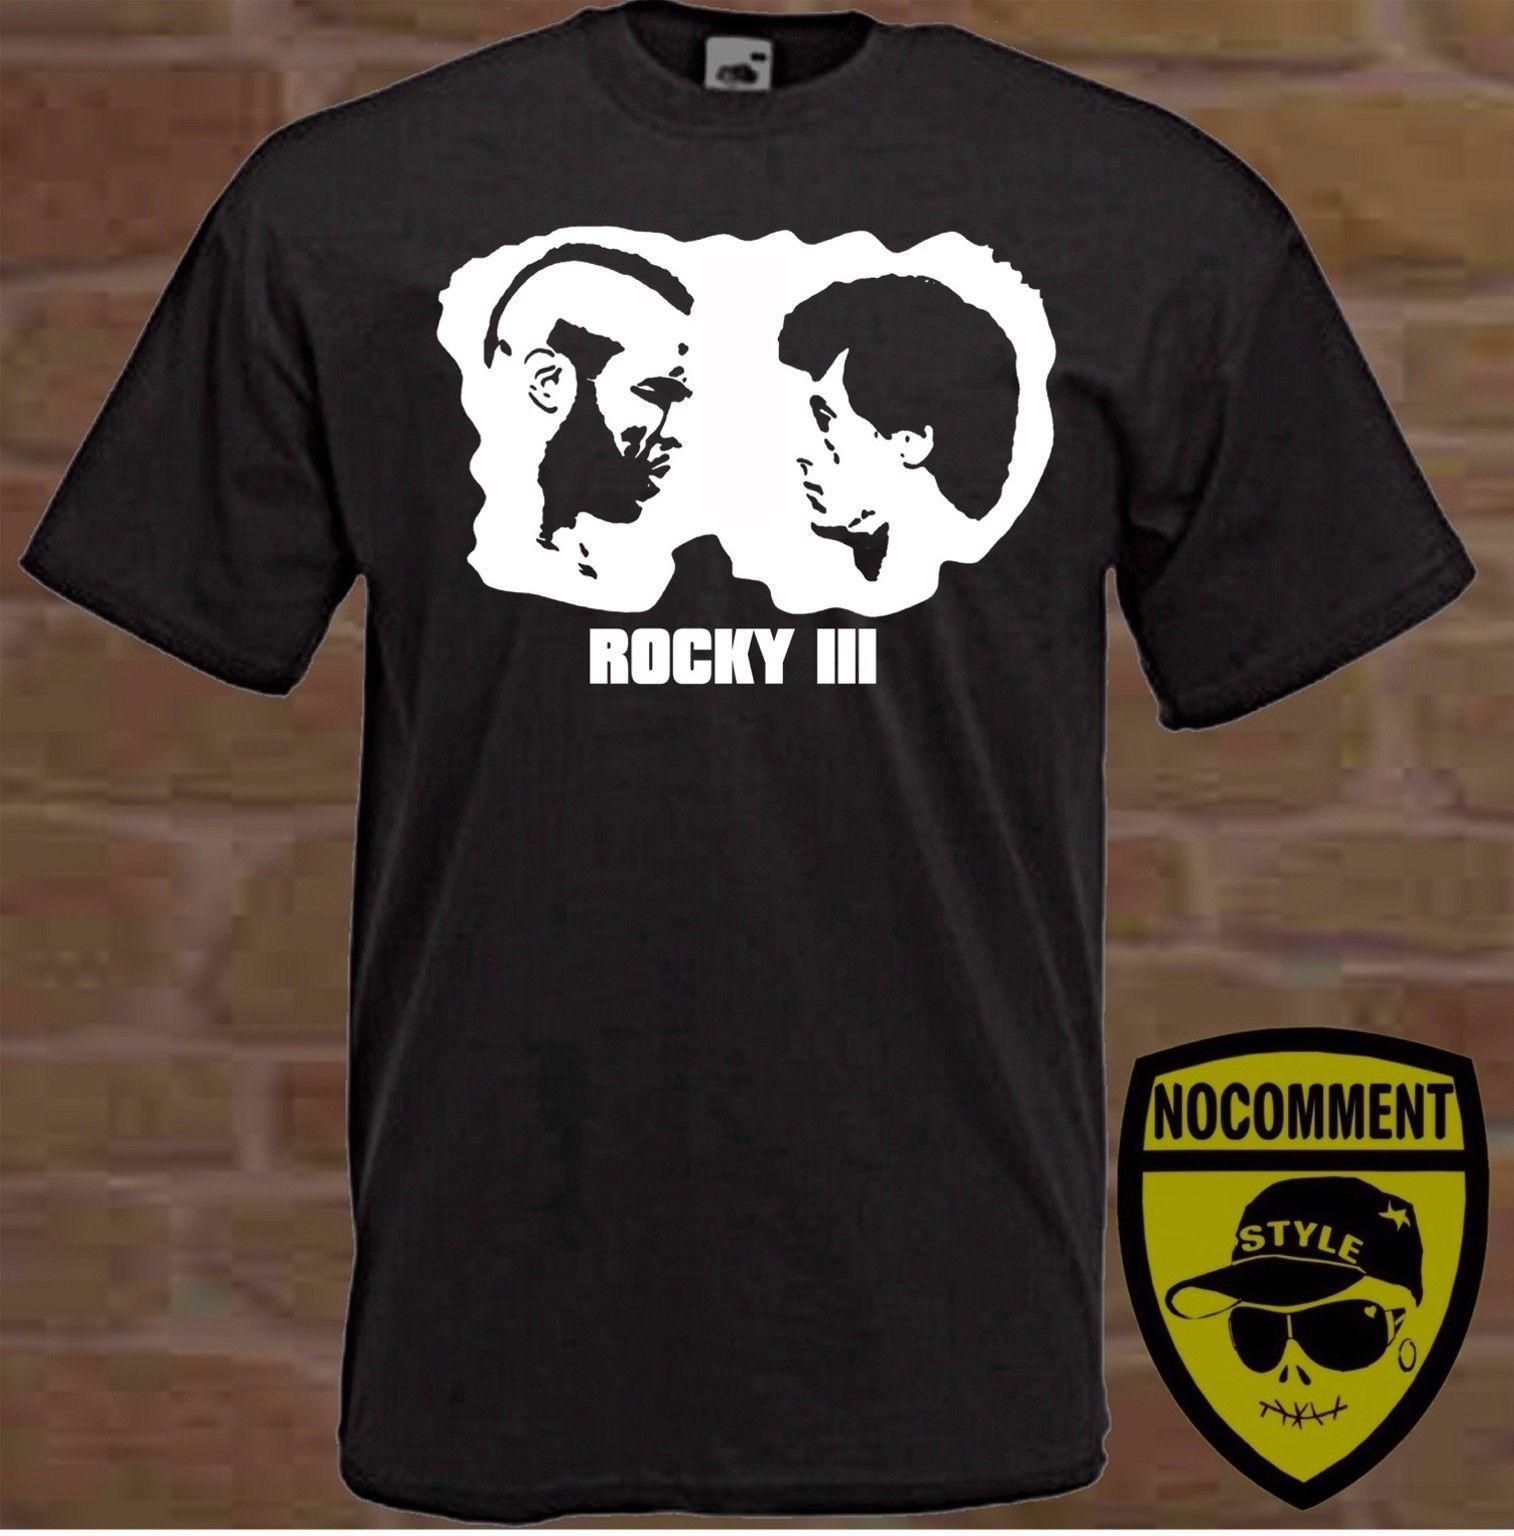 l'ultimo 3e804 c0b41 T-shirt personalizzate ROCKY III film Sly Stallone taglie S M L XL XXL XXXL